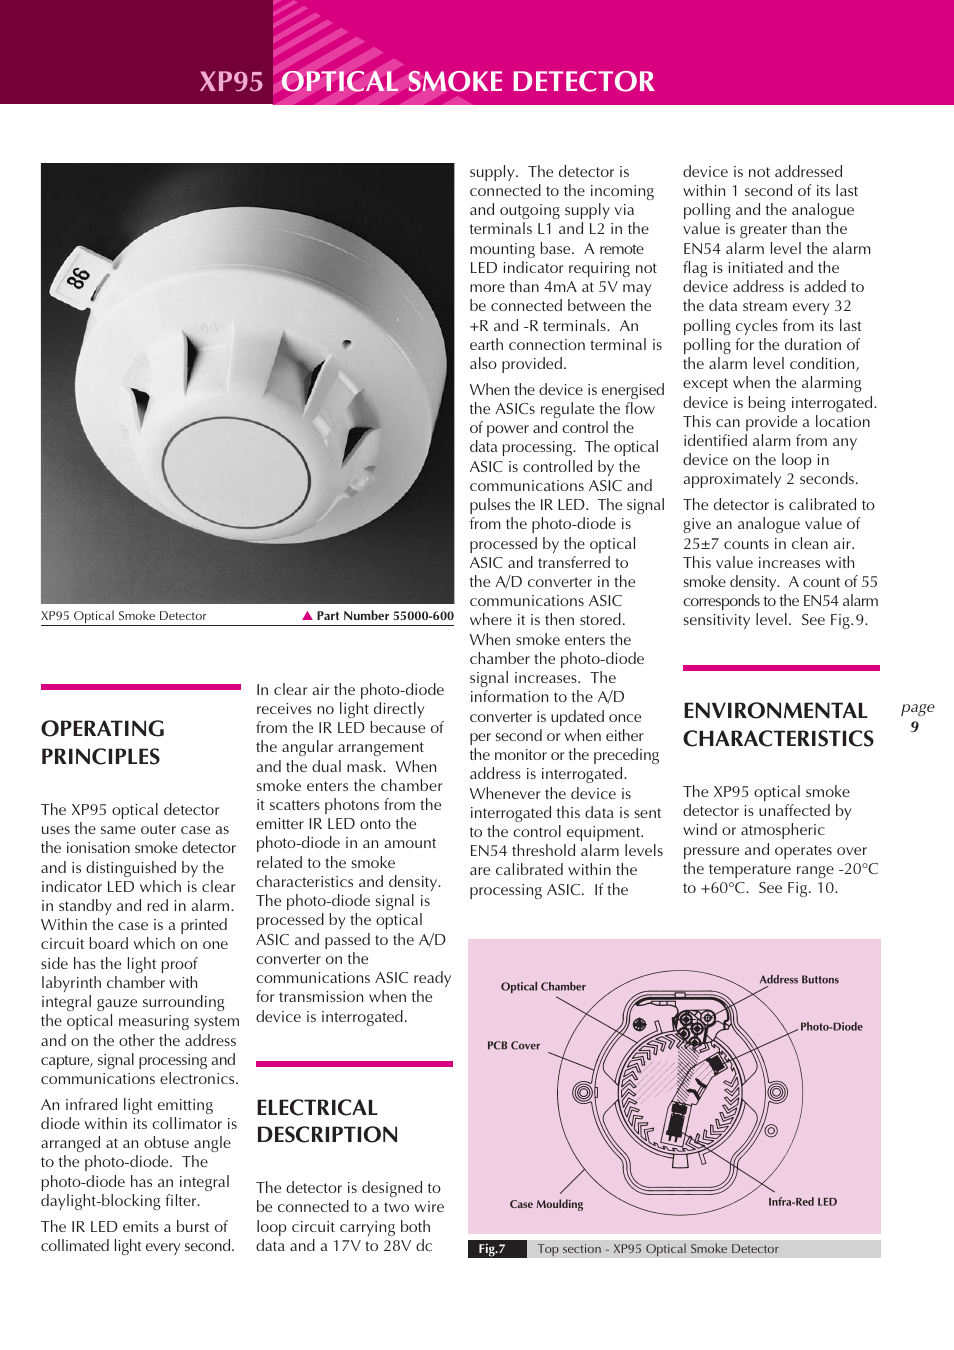 Xp95 Optical Smoke Detector Operating Principles Electrical Apollo Wiring Diagram Description User Manual Page 9 24